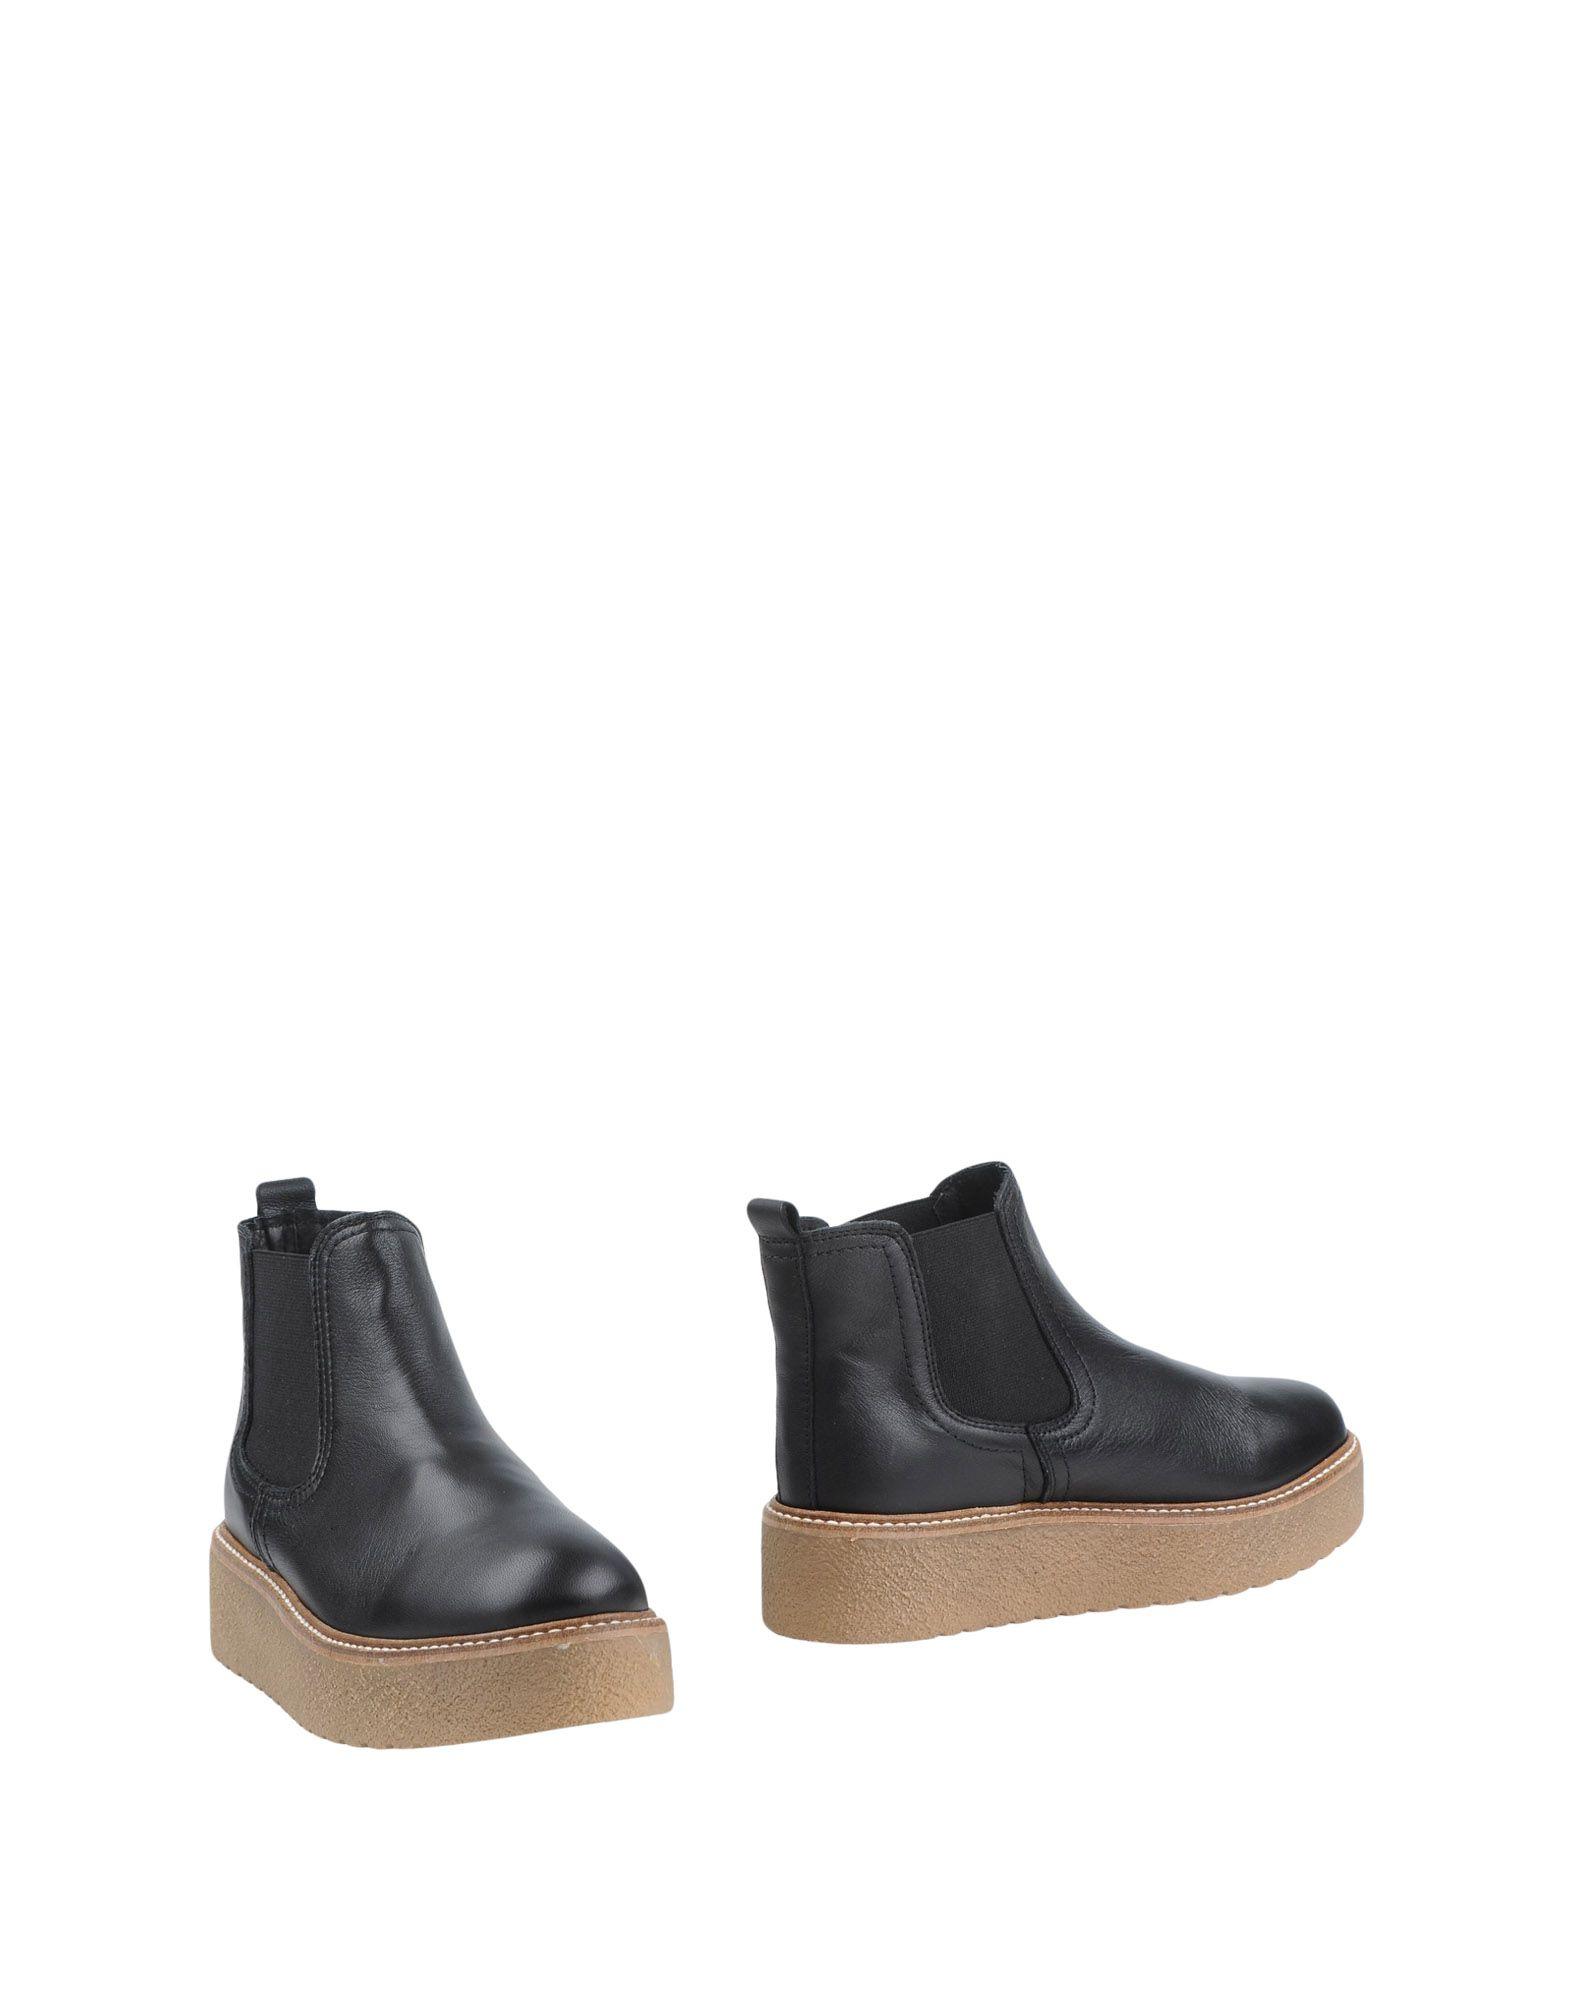 Cuplé 11311514NS Chelsea Boots Damen  11311514NS Cuplé Gute Qualität beliebte Schuhe 30d840